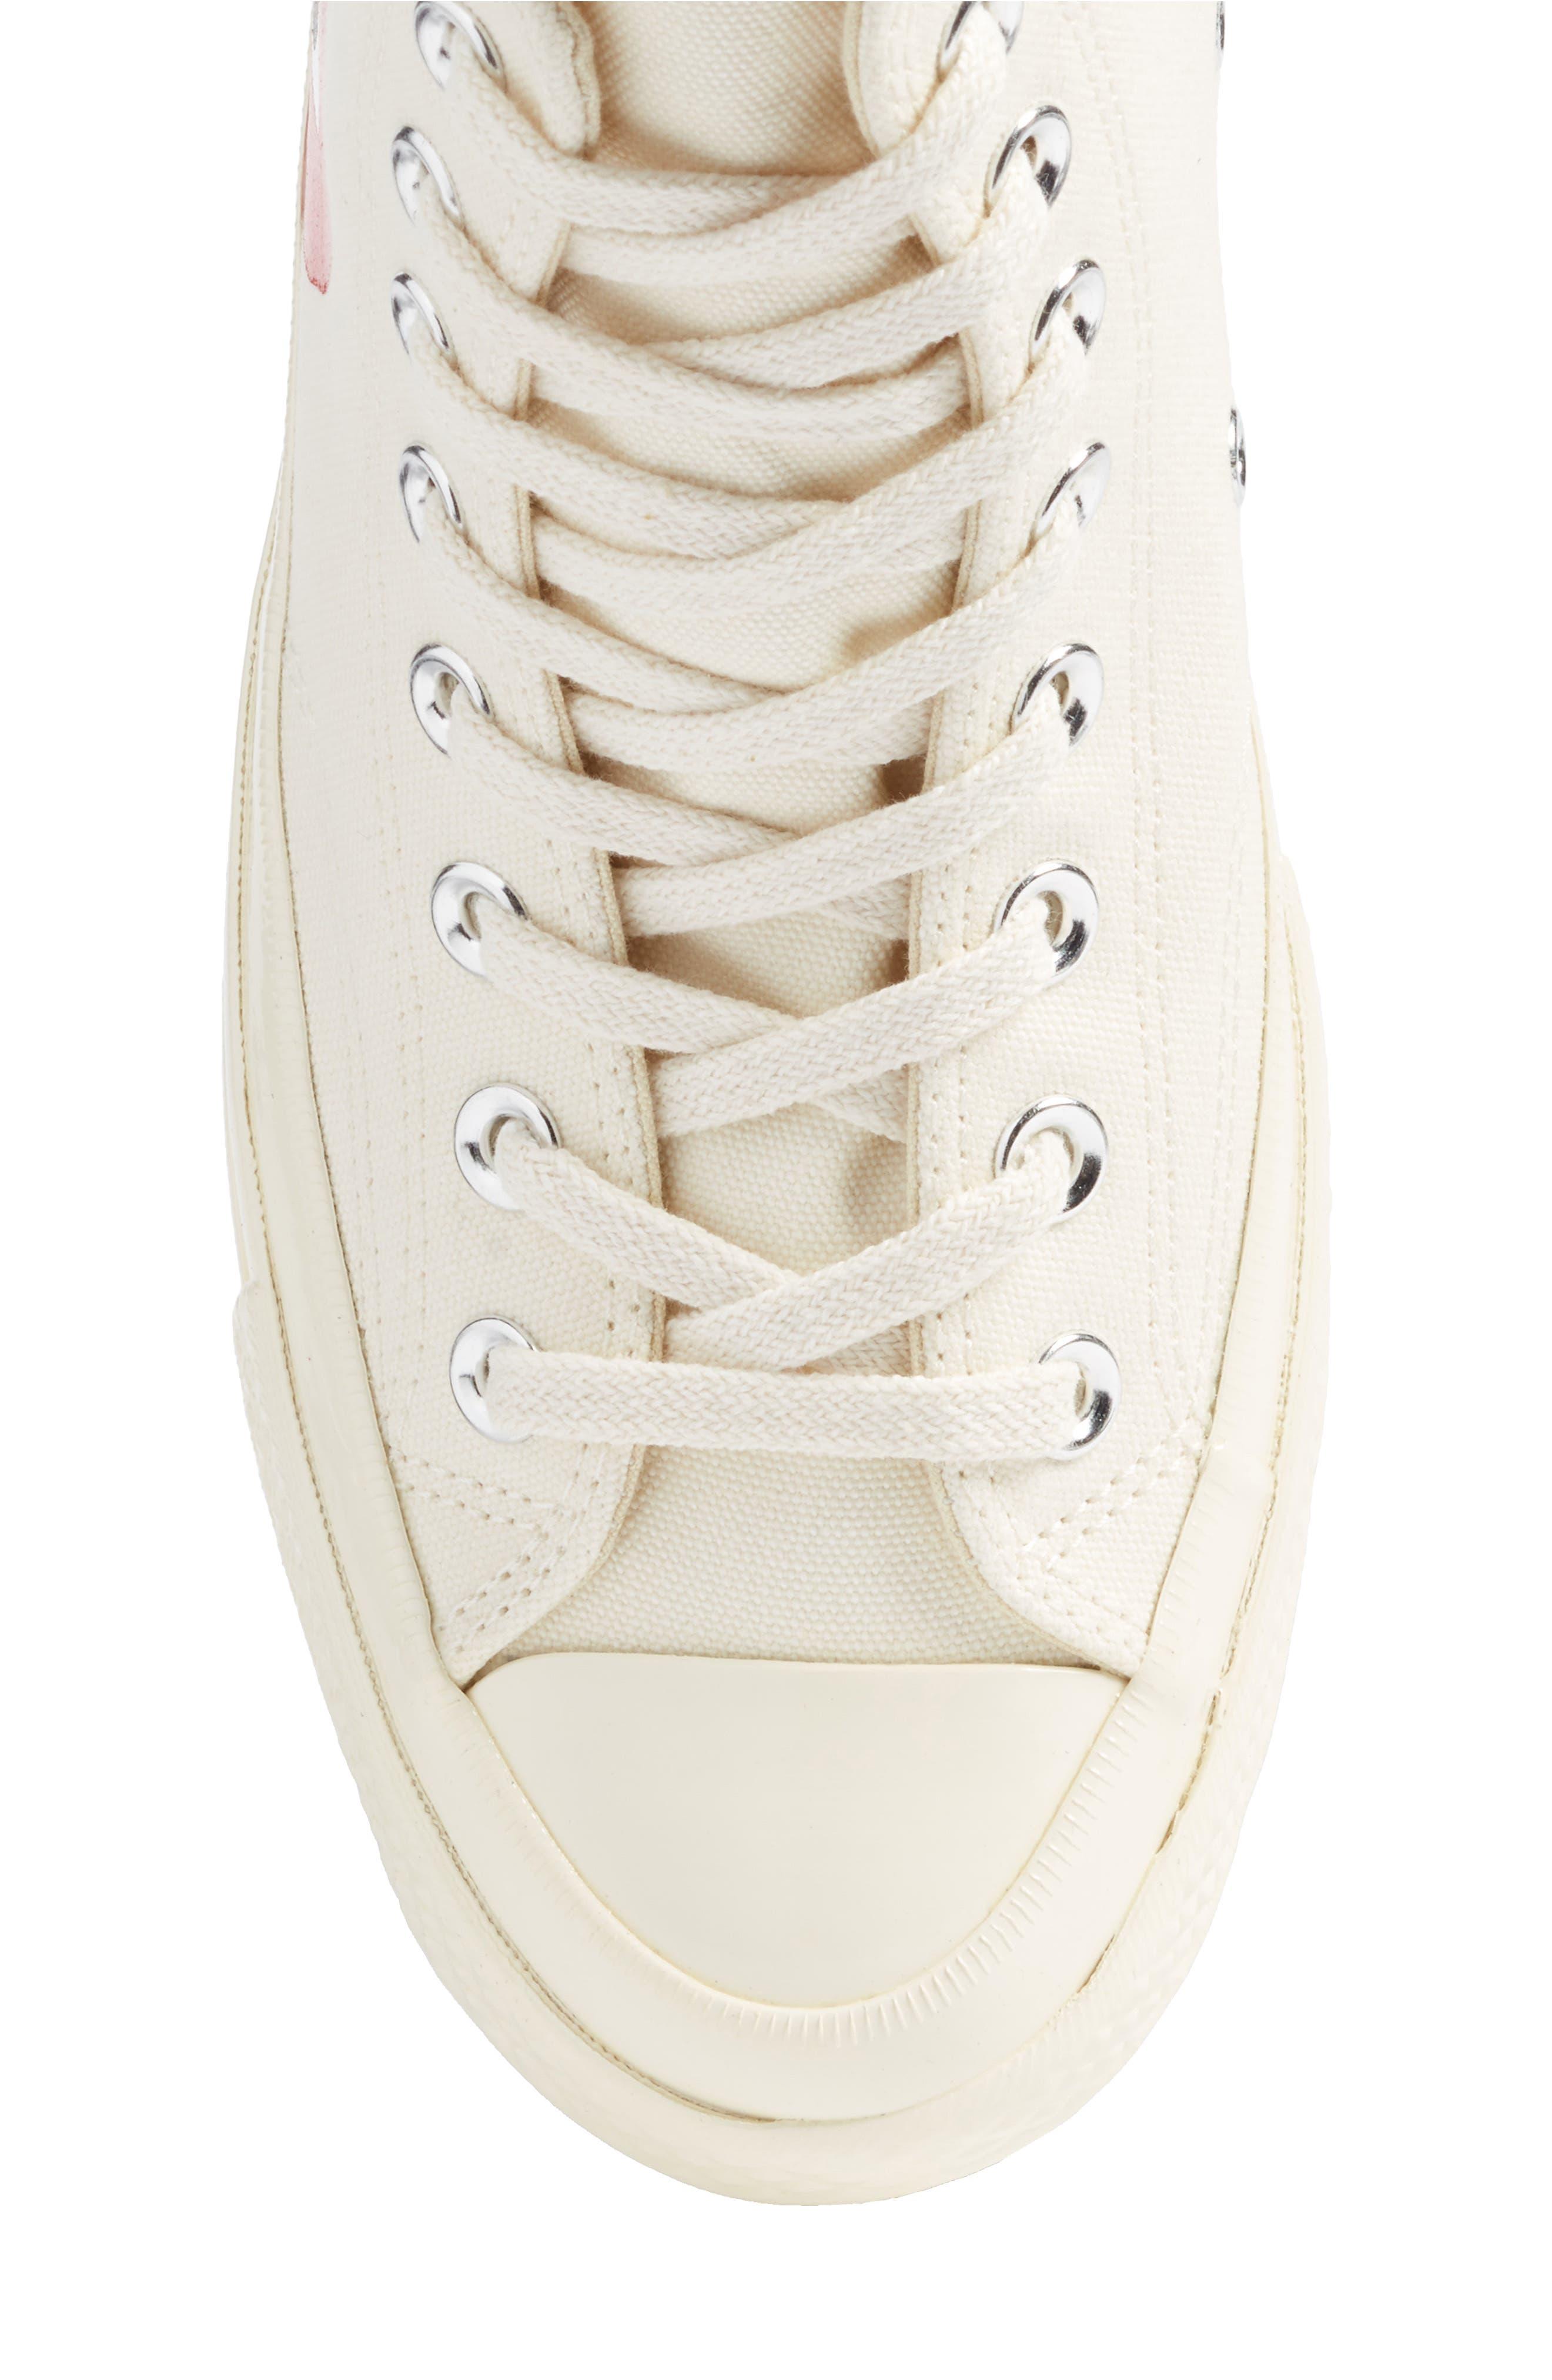 PLAYx Converse Chuck Taylor<sup>®</sup> - Hidden Heart High TopSneaker,                             Alternate thumbnail 5, color,                             WHITE CANVAS